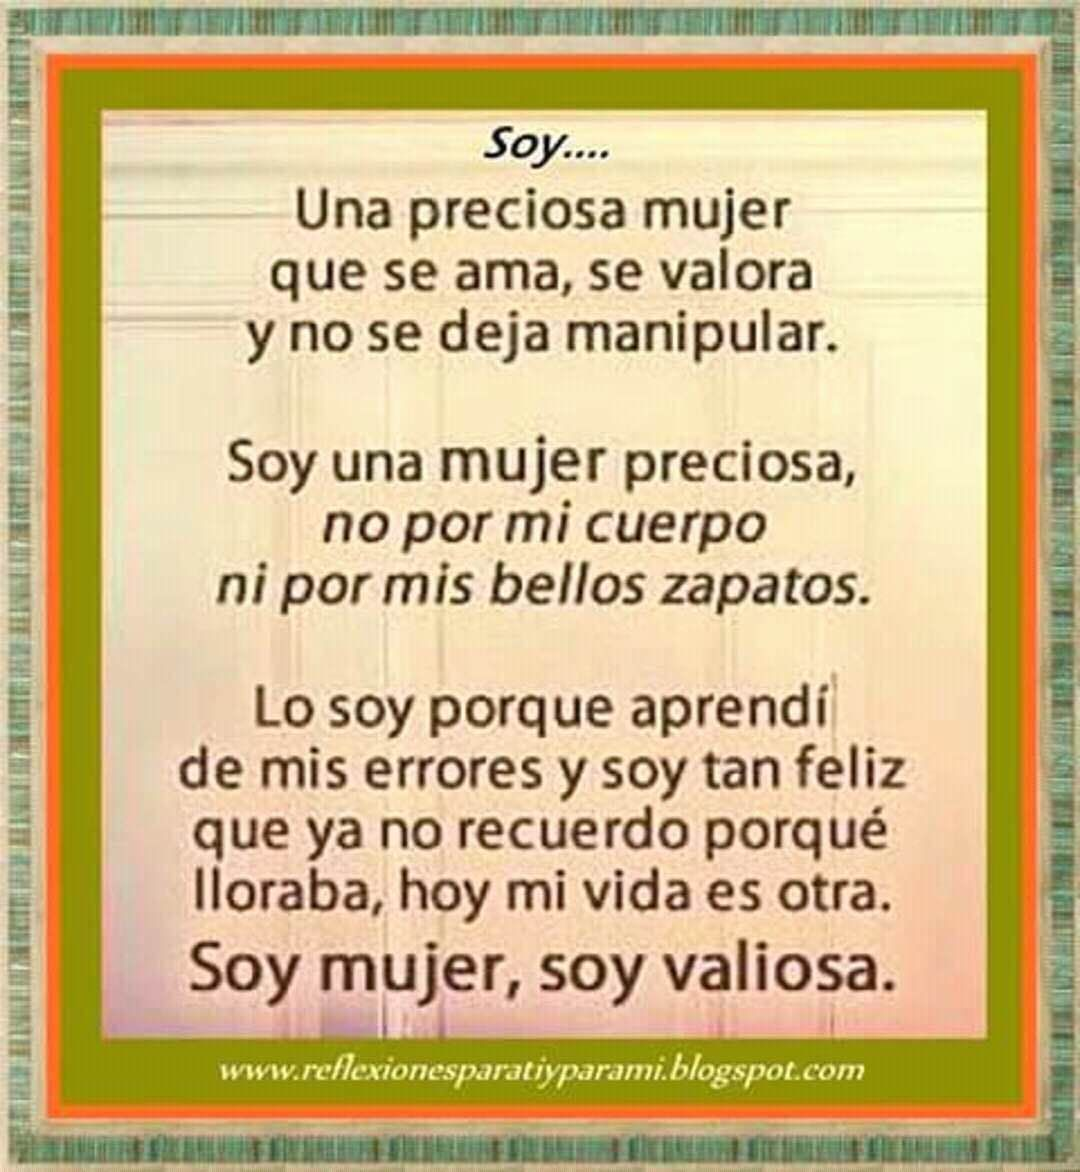 #SoyMoranza